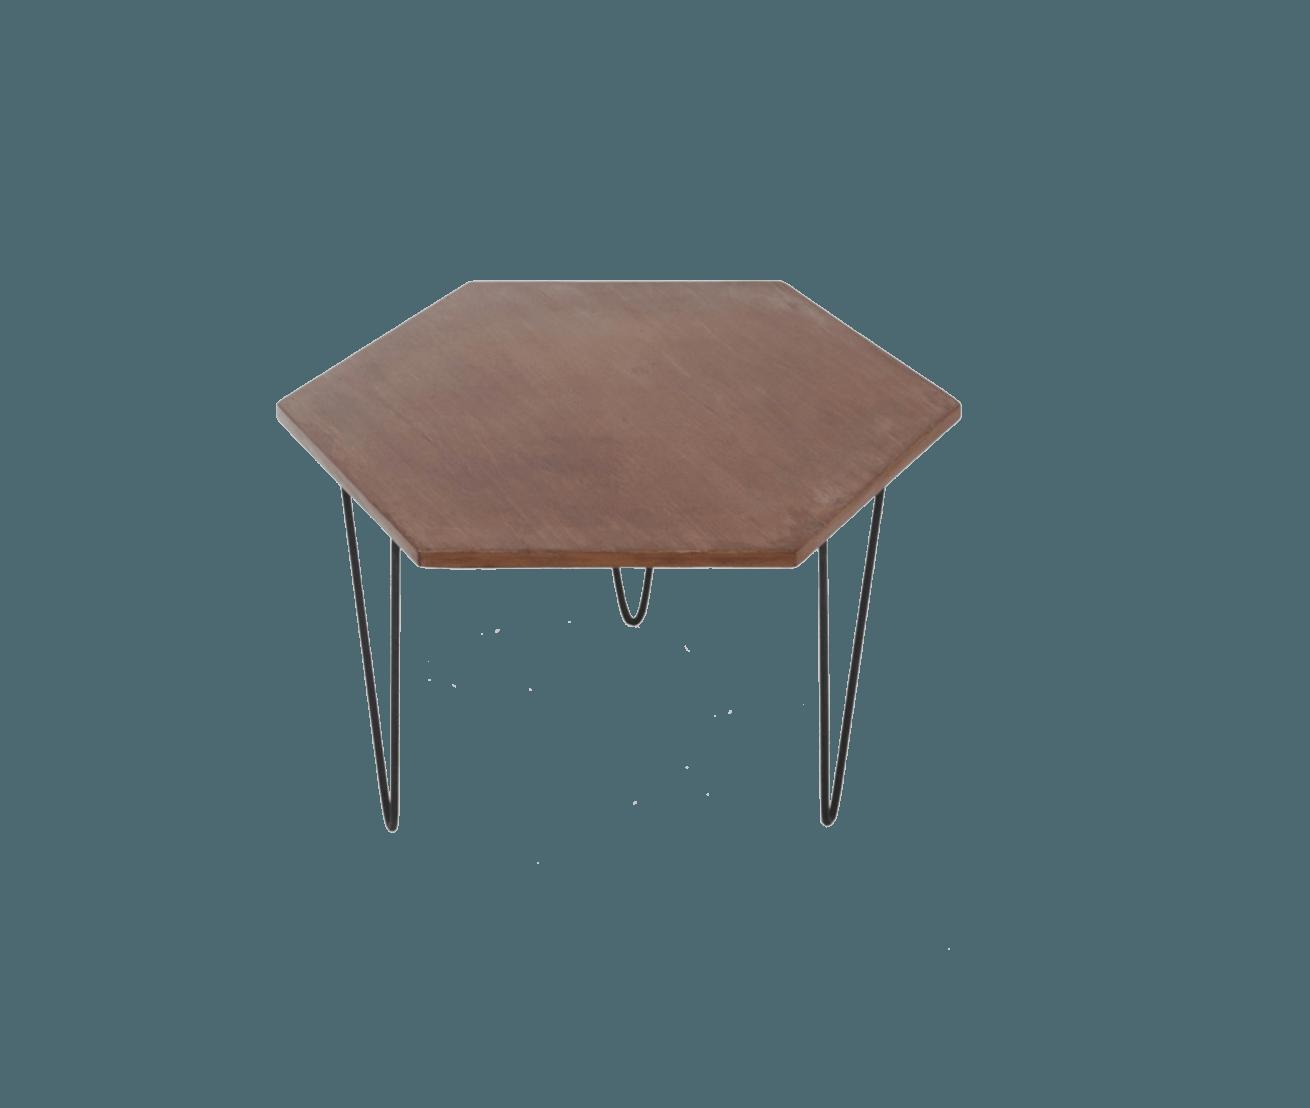 alexandra senes the socialite family. Black Bedroom Furniture Sets. Home Design Ideas